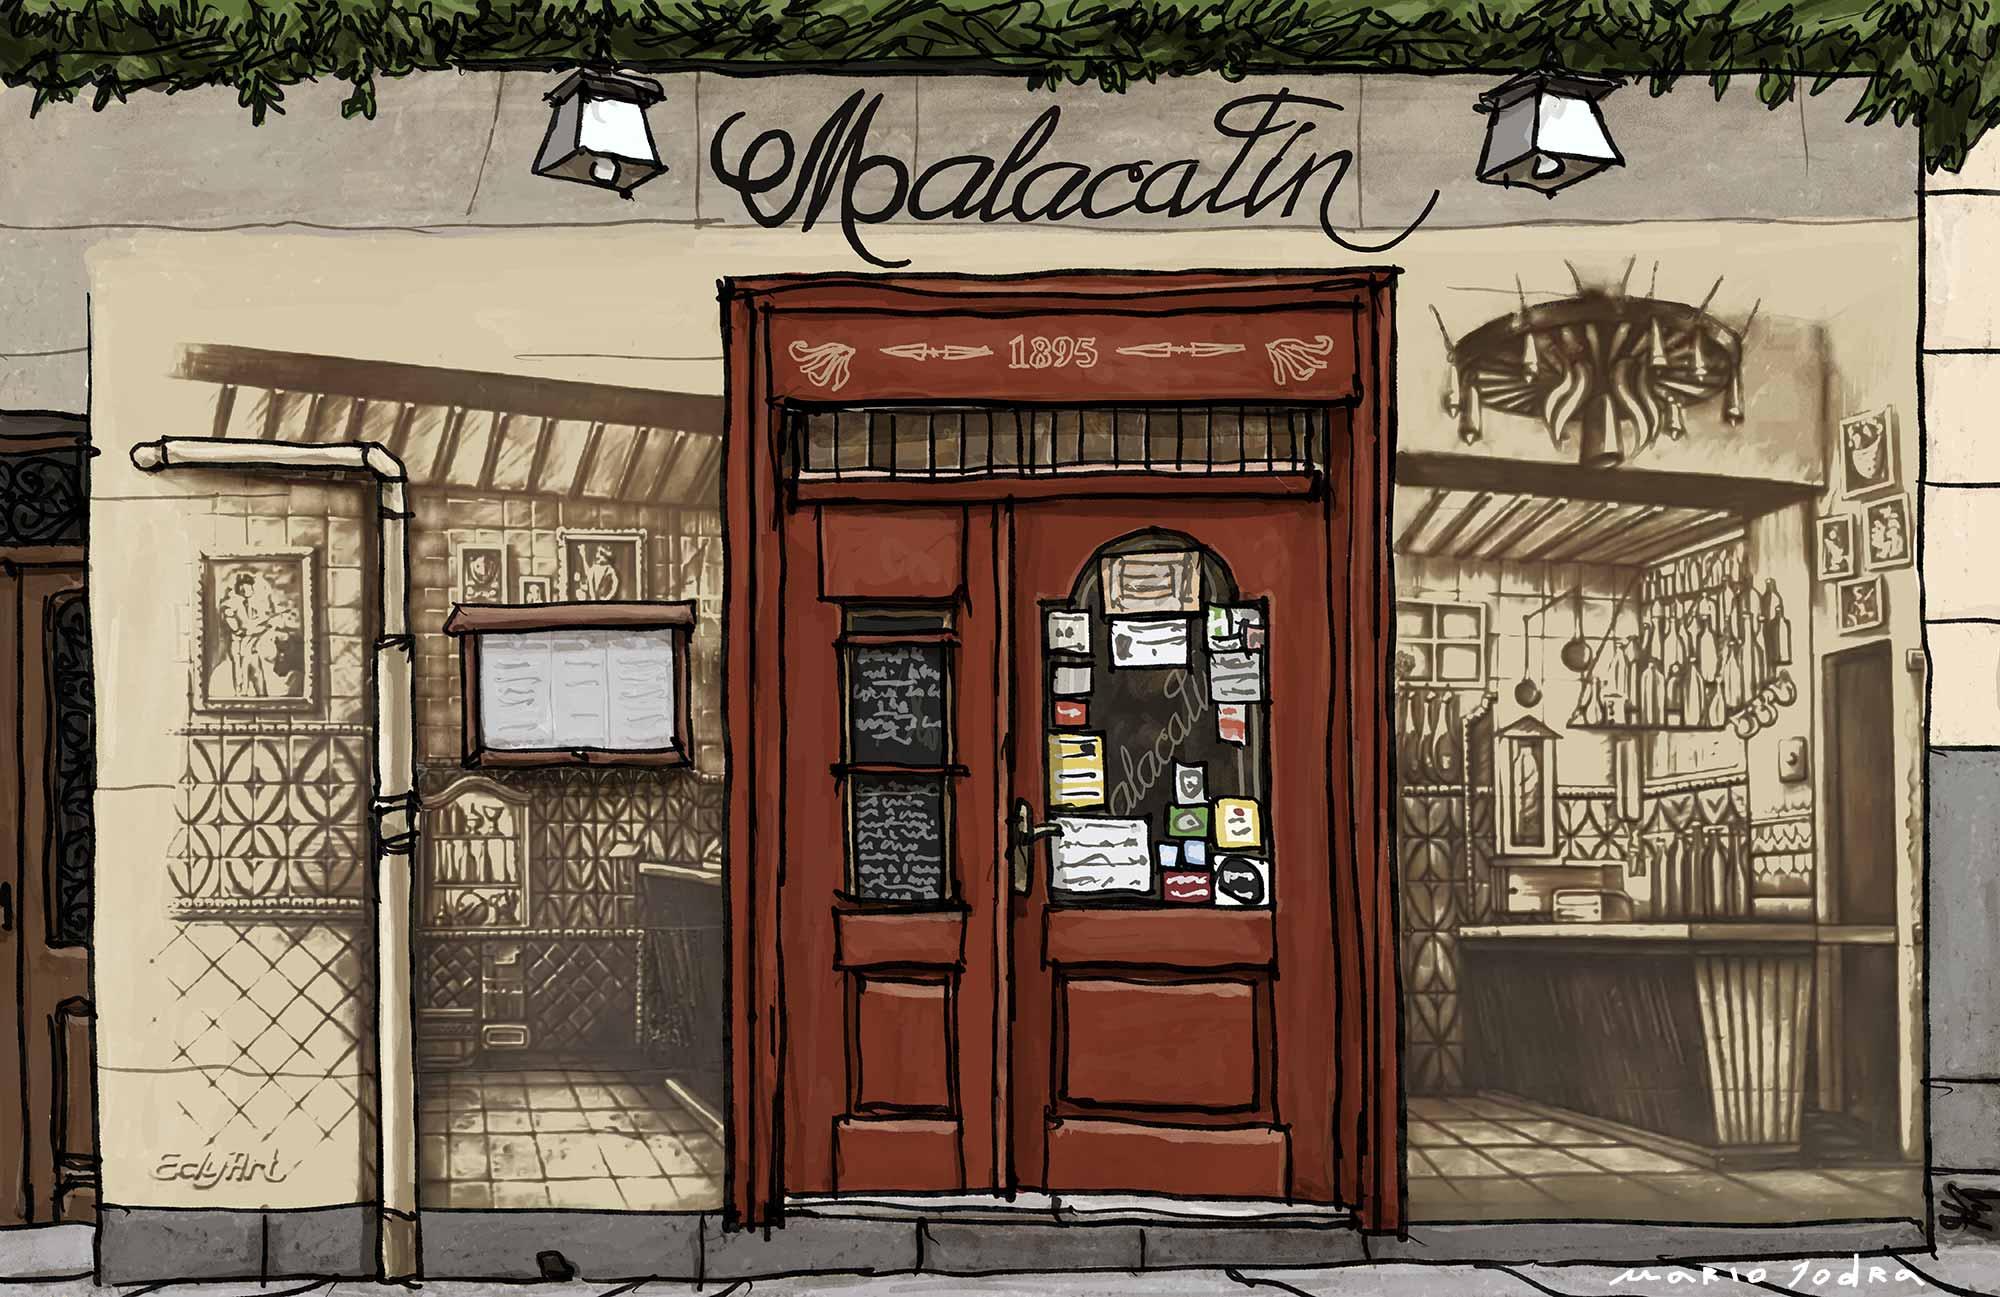 Mario Jodra illustration Art - Malacatín. Madrid restaurants. Since 1895